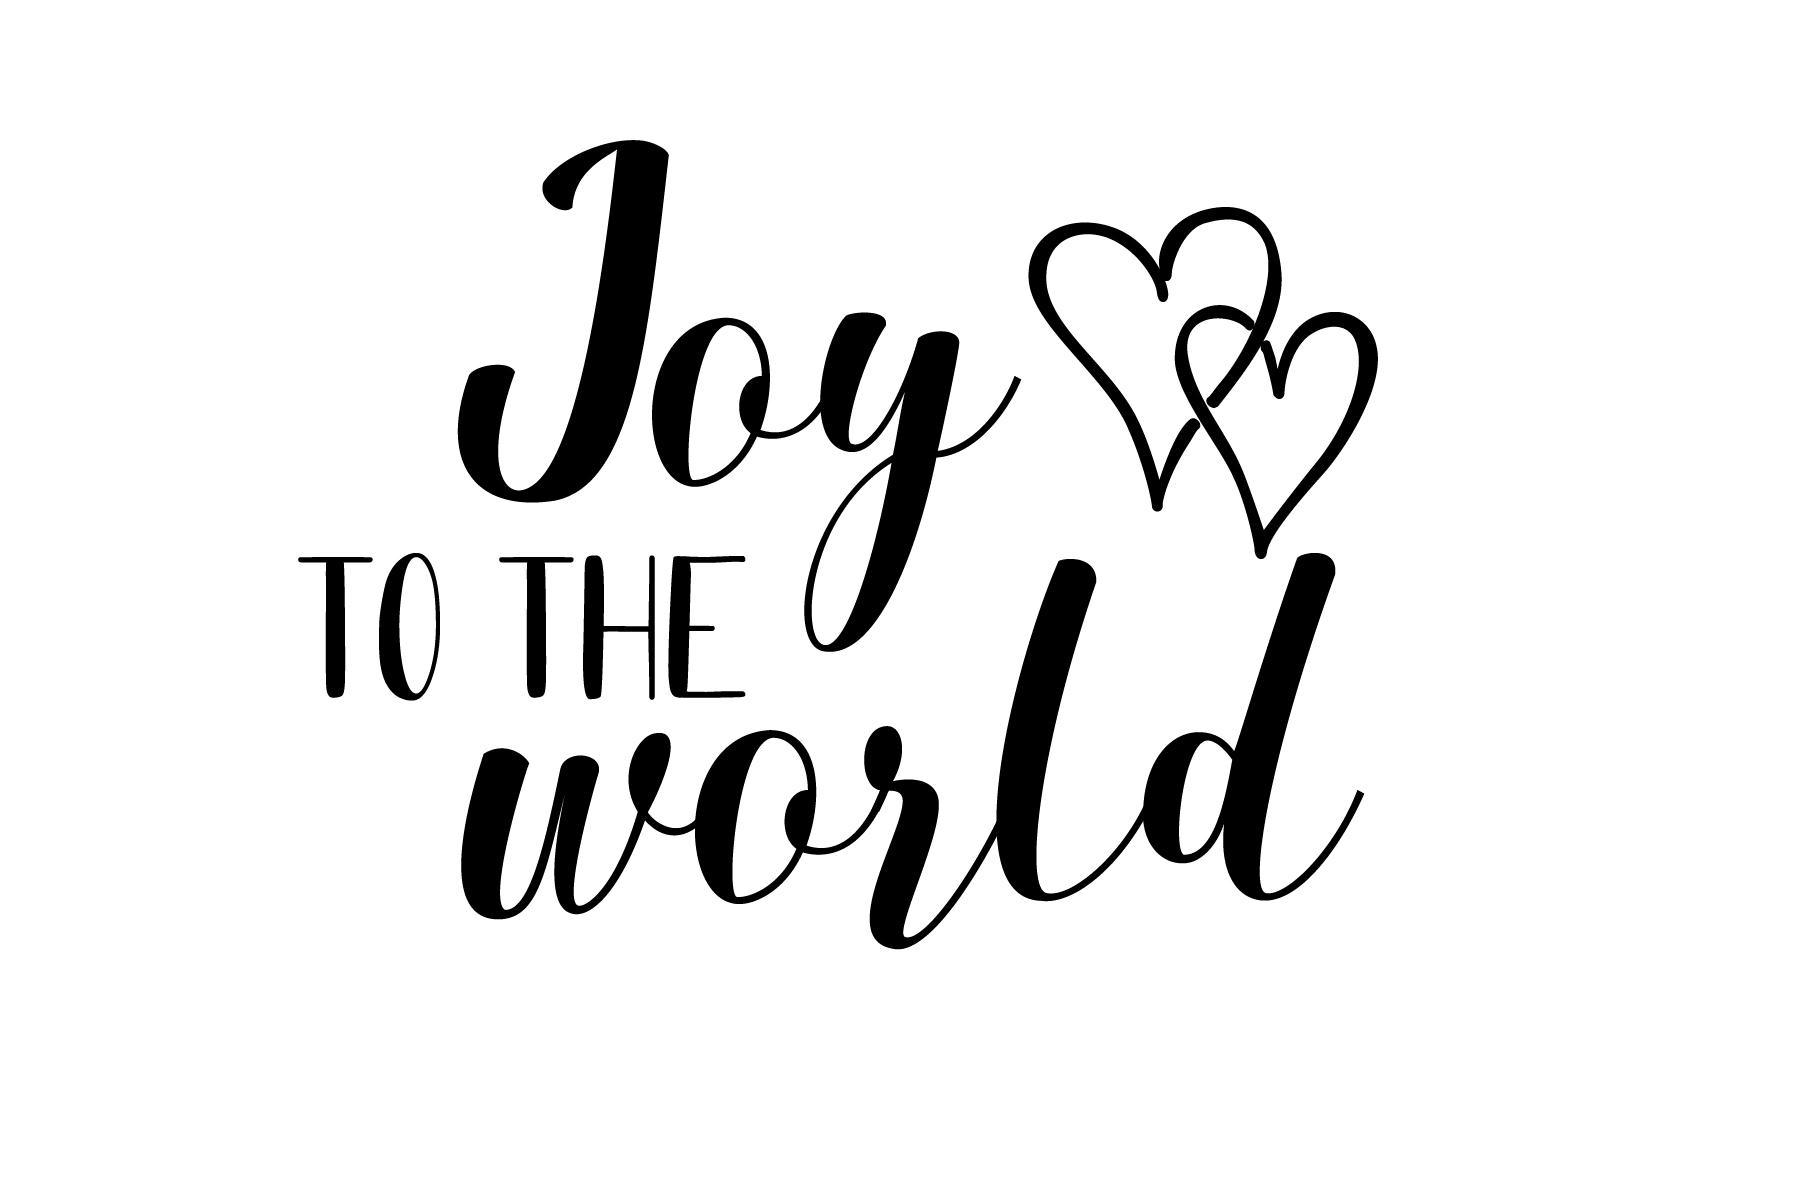 Christmas Sayings, Quotes, SVG Cut FIle, Mug, Tshirt Designs example image 4